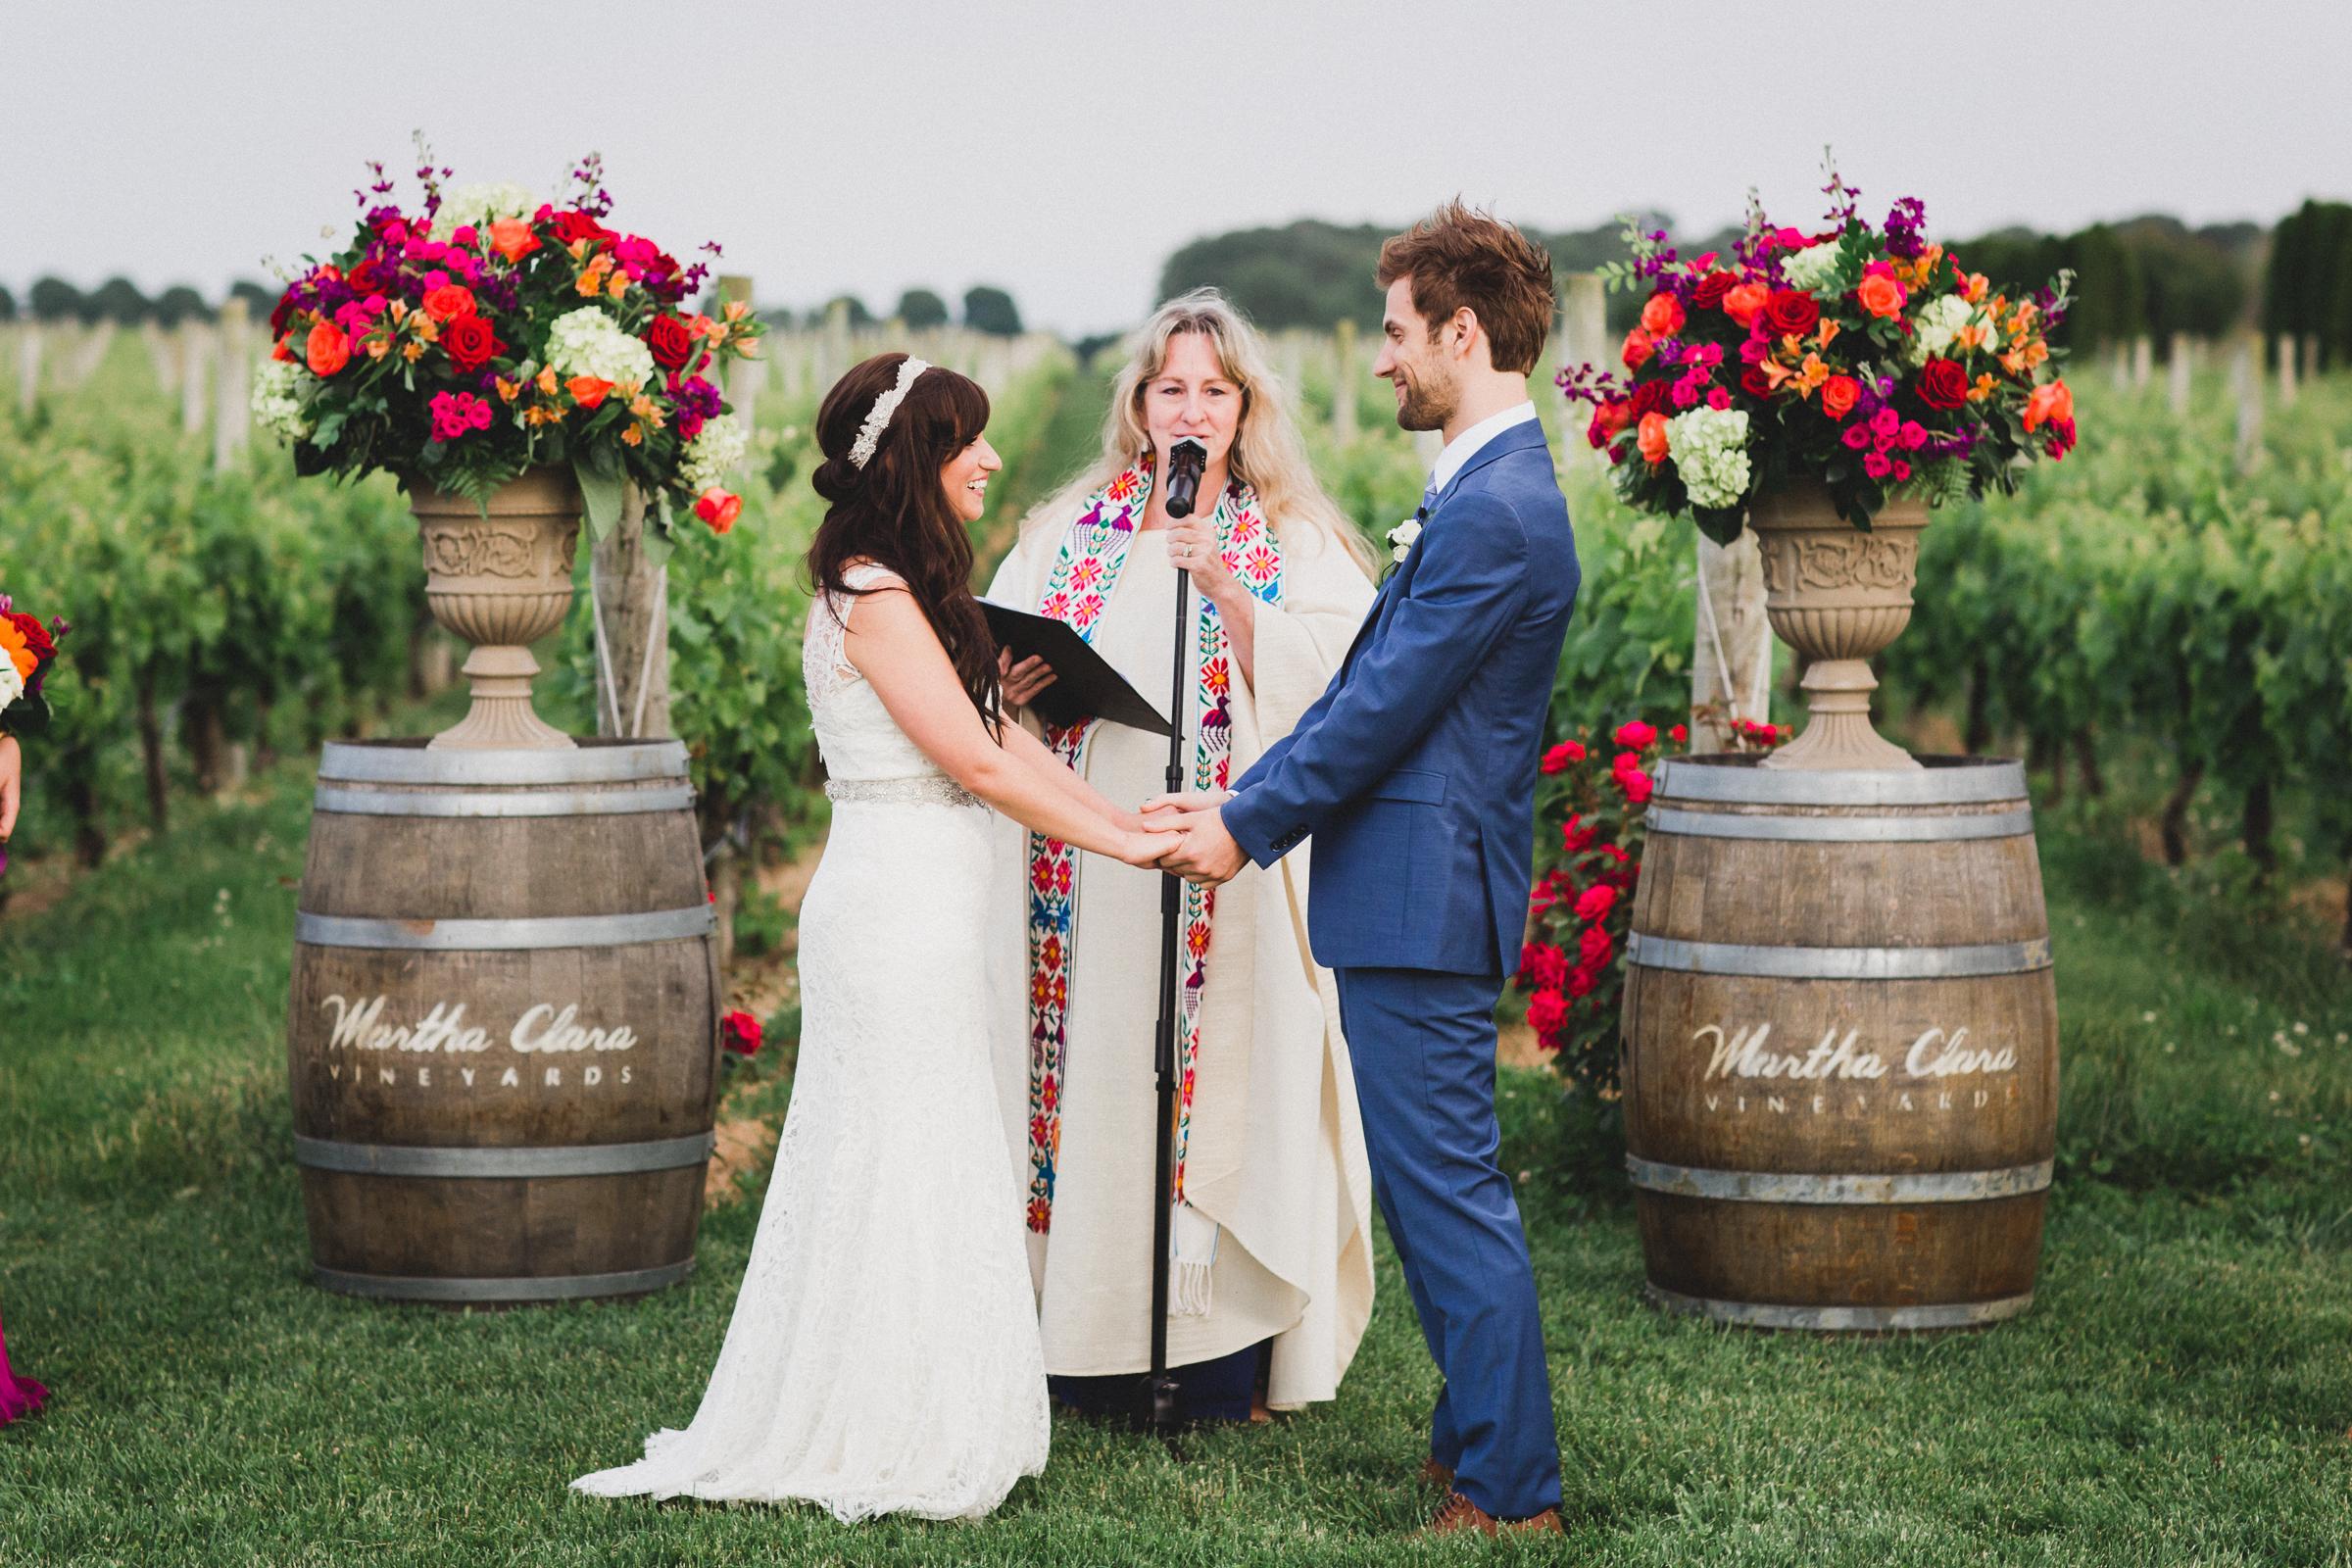 Martha-Clara-Vineyard-Long-Island-Documentary-Wedding-Photographer-52.jpg